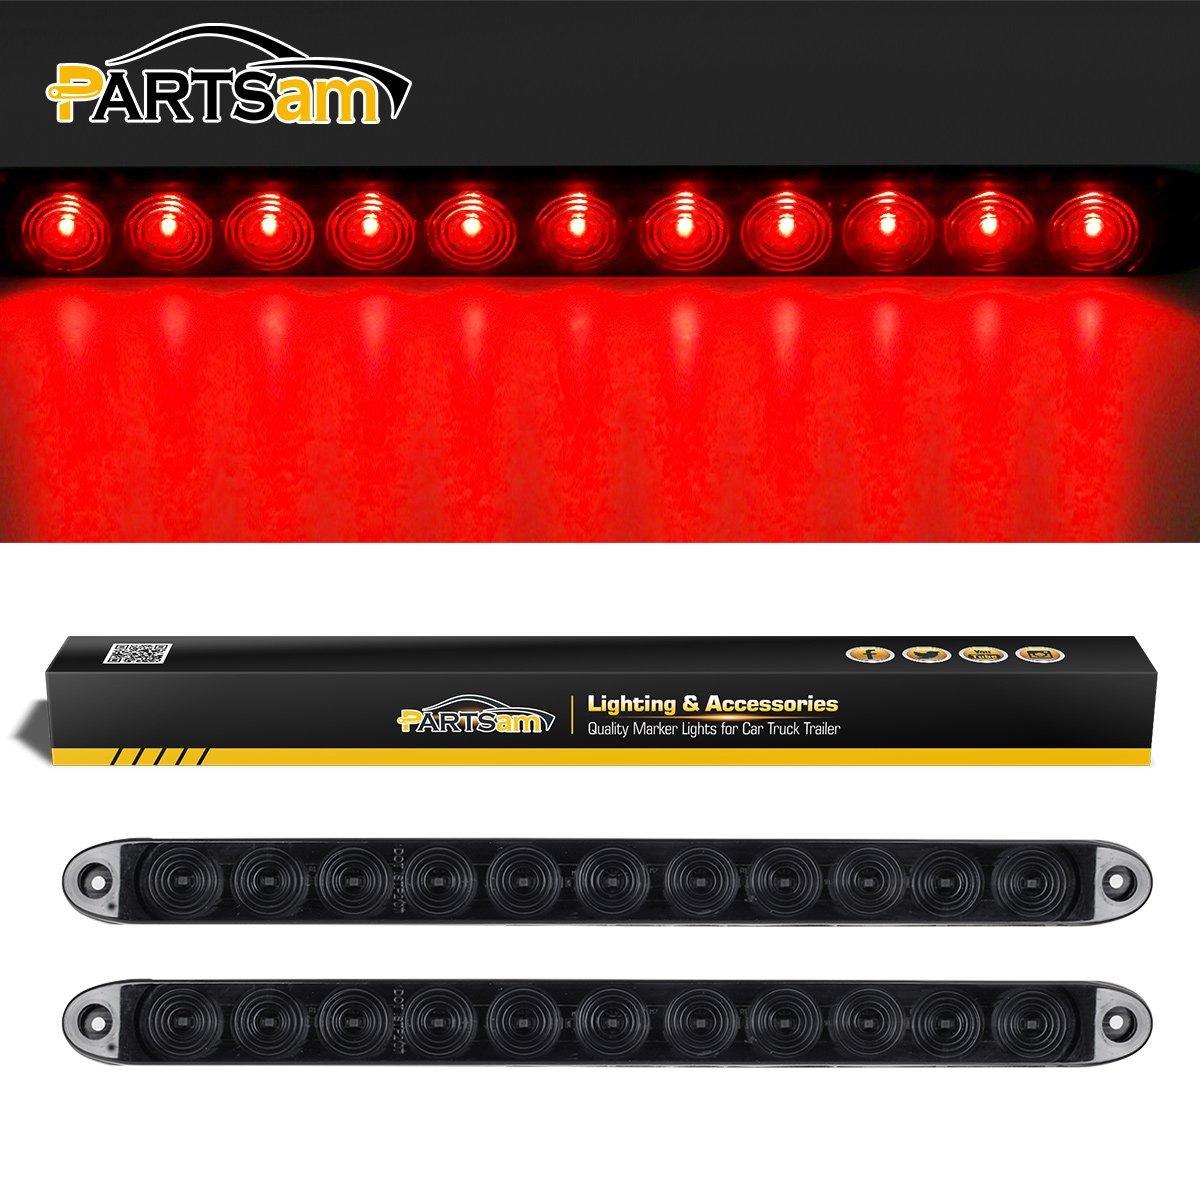 Partsam 2X 15 Smoke Lens Red 11 LED Car Trailer Truck Stop Turn Tail Brake Light ID Bar Waterproof